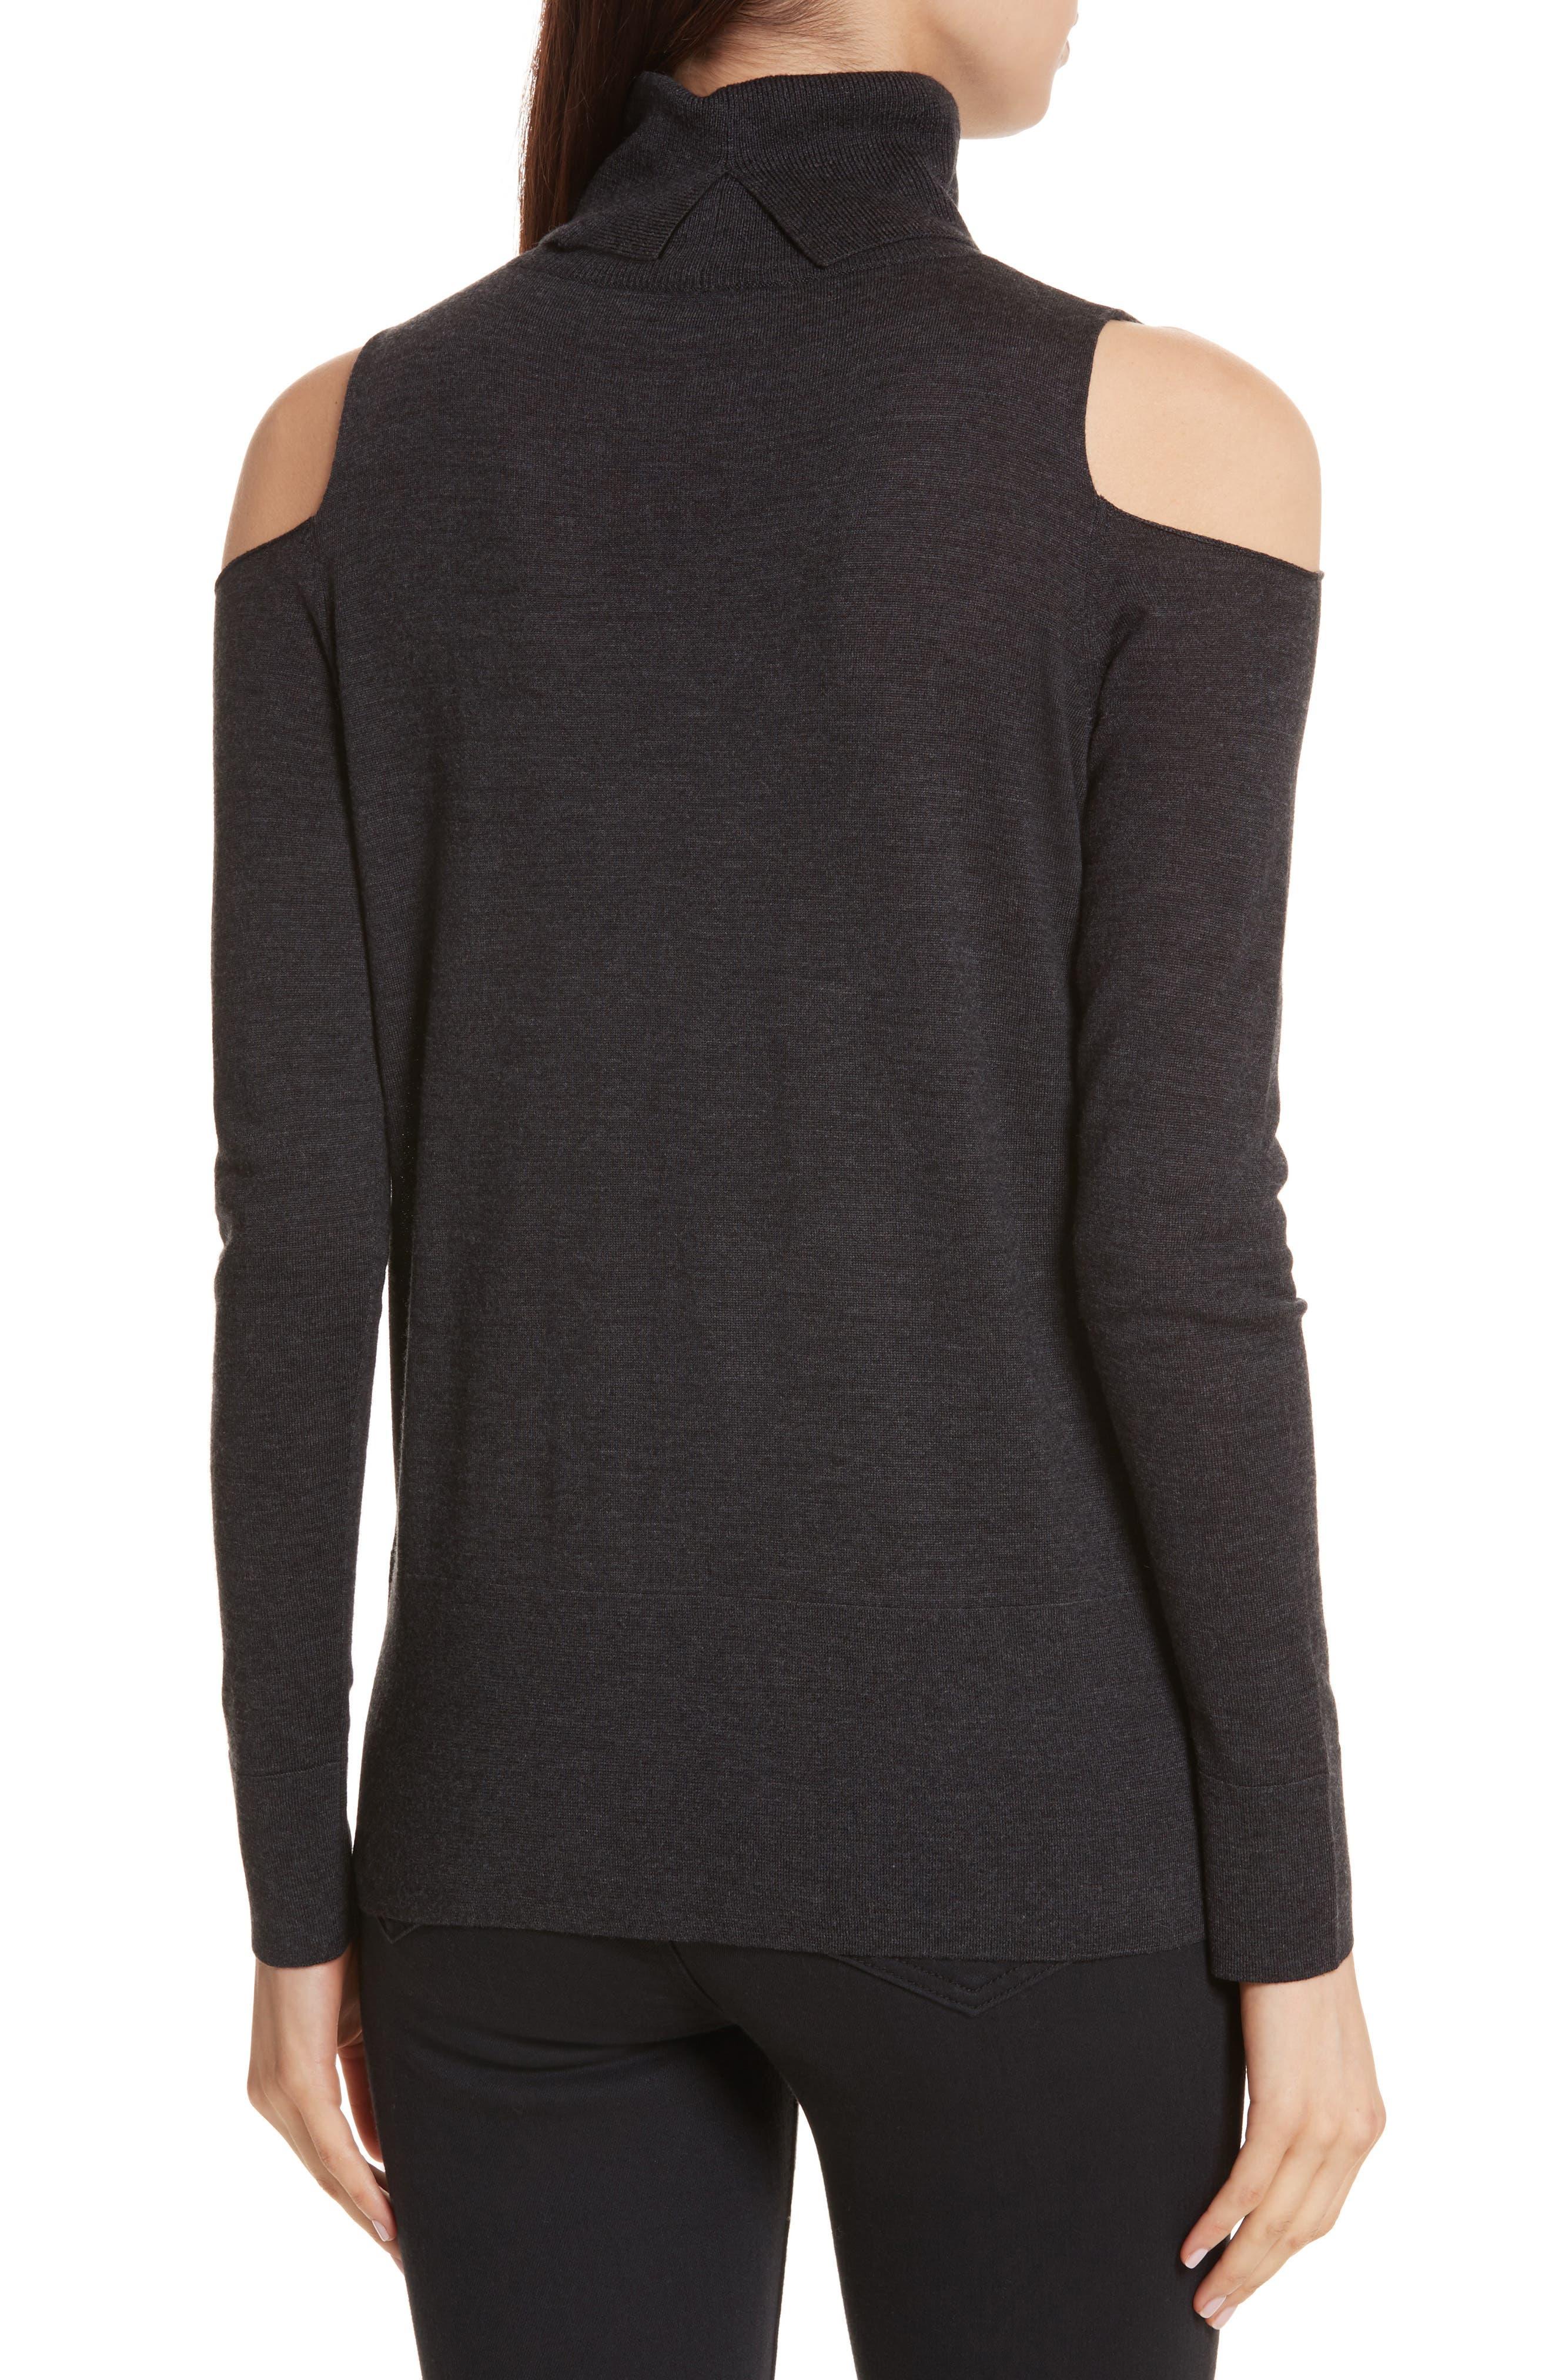 Alternate Image 2  - Allude Merino Wool Cold Shoulder Turtleneck Sweater